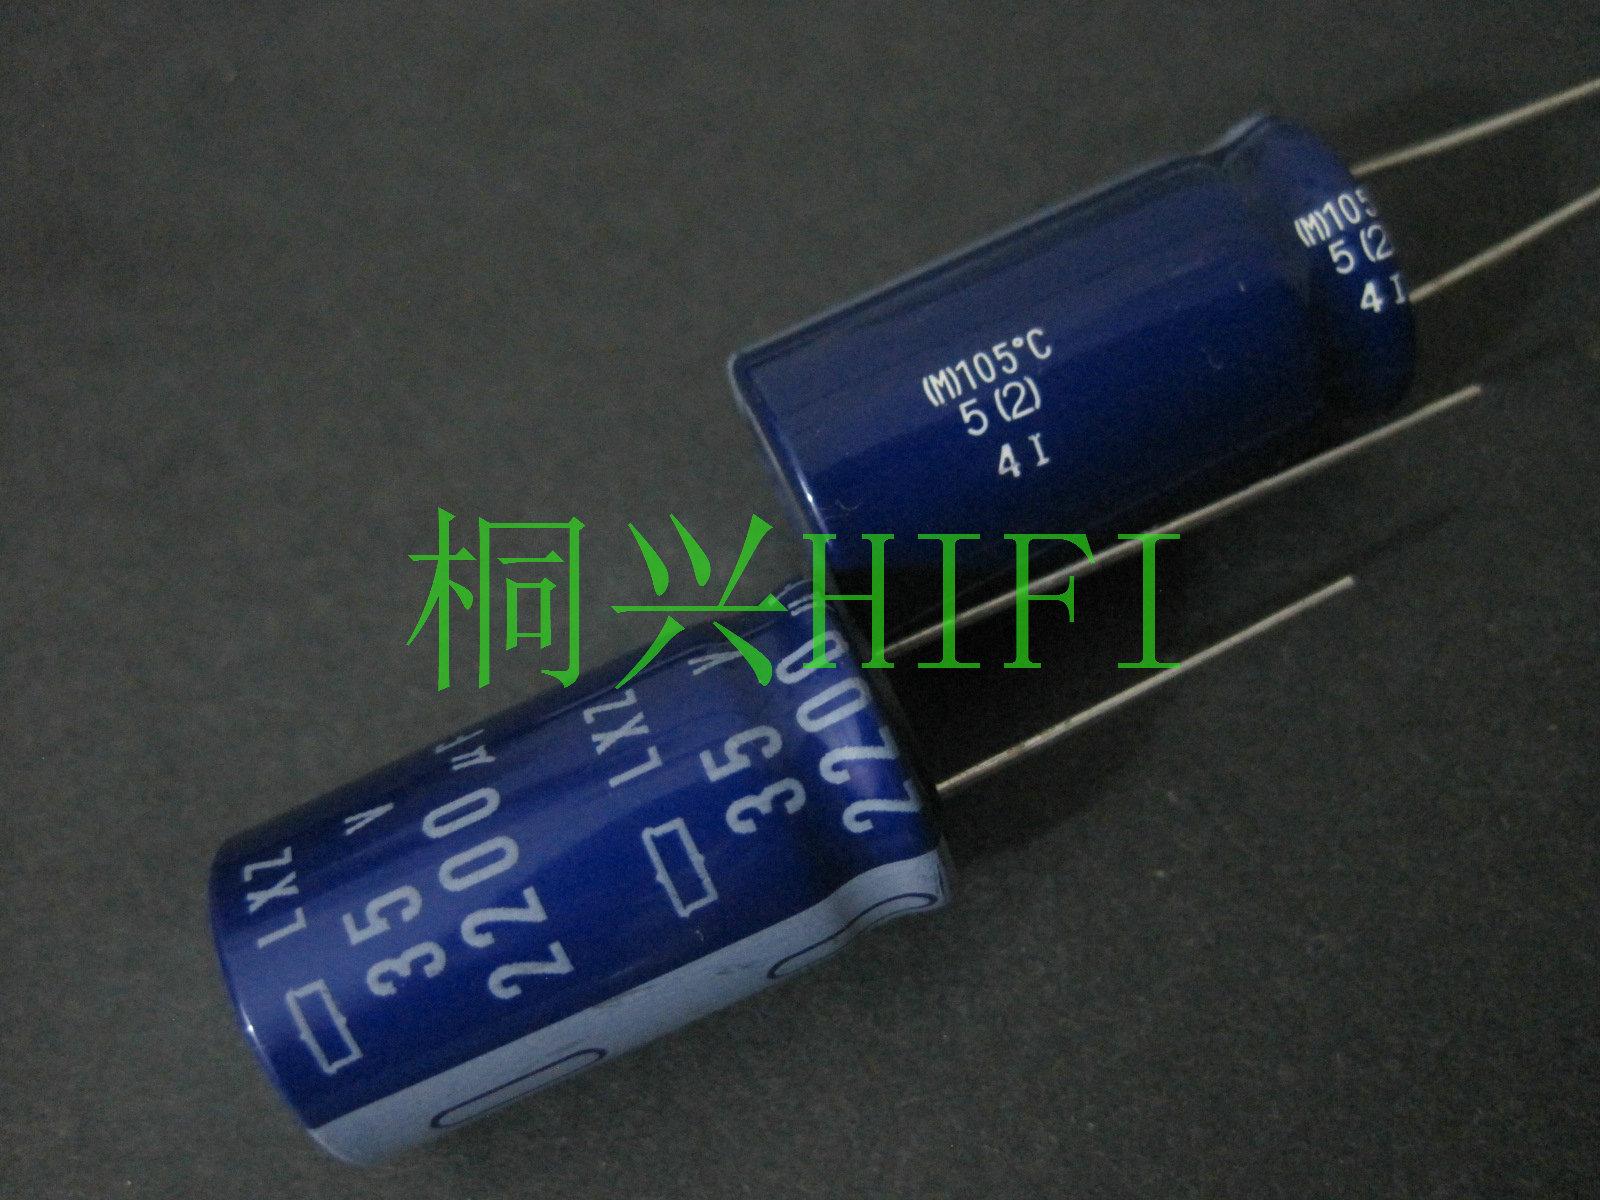 20 pces novo nippon lxz 35v2200uf 16x31.5mm capacitor eletrolítico ncc 2200 uf 35v lxz CHEMI-CON 2200 uf/35 v ultra baixa impedância